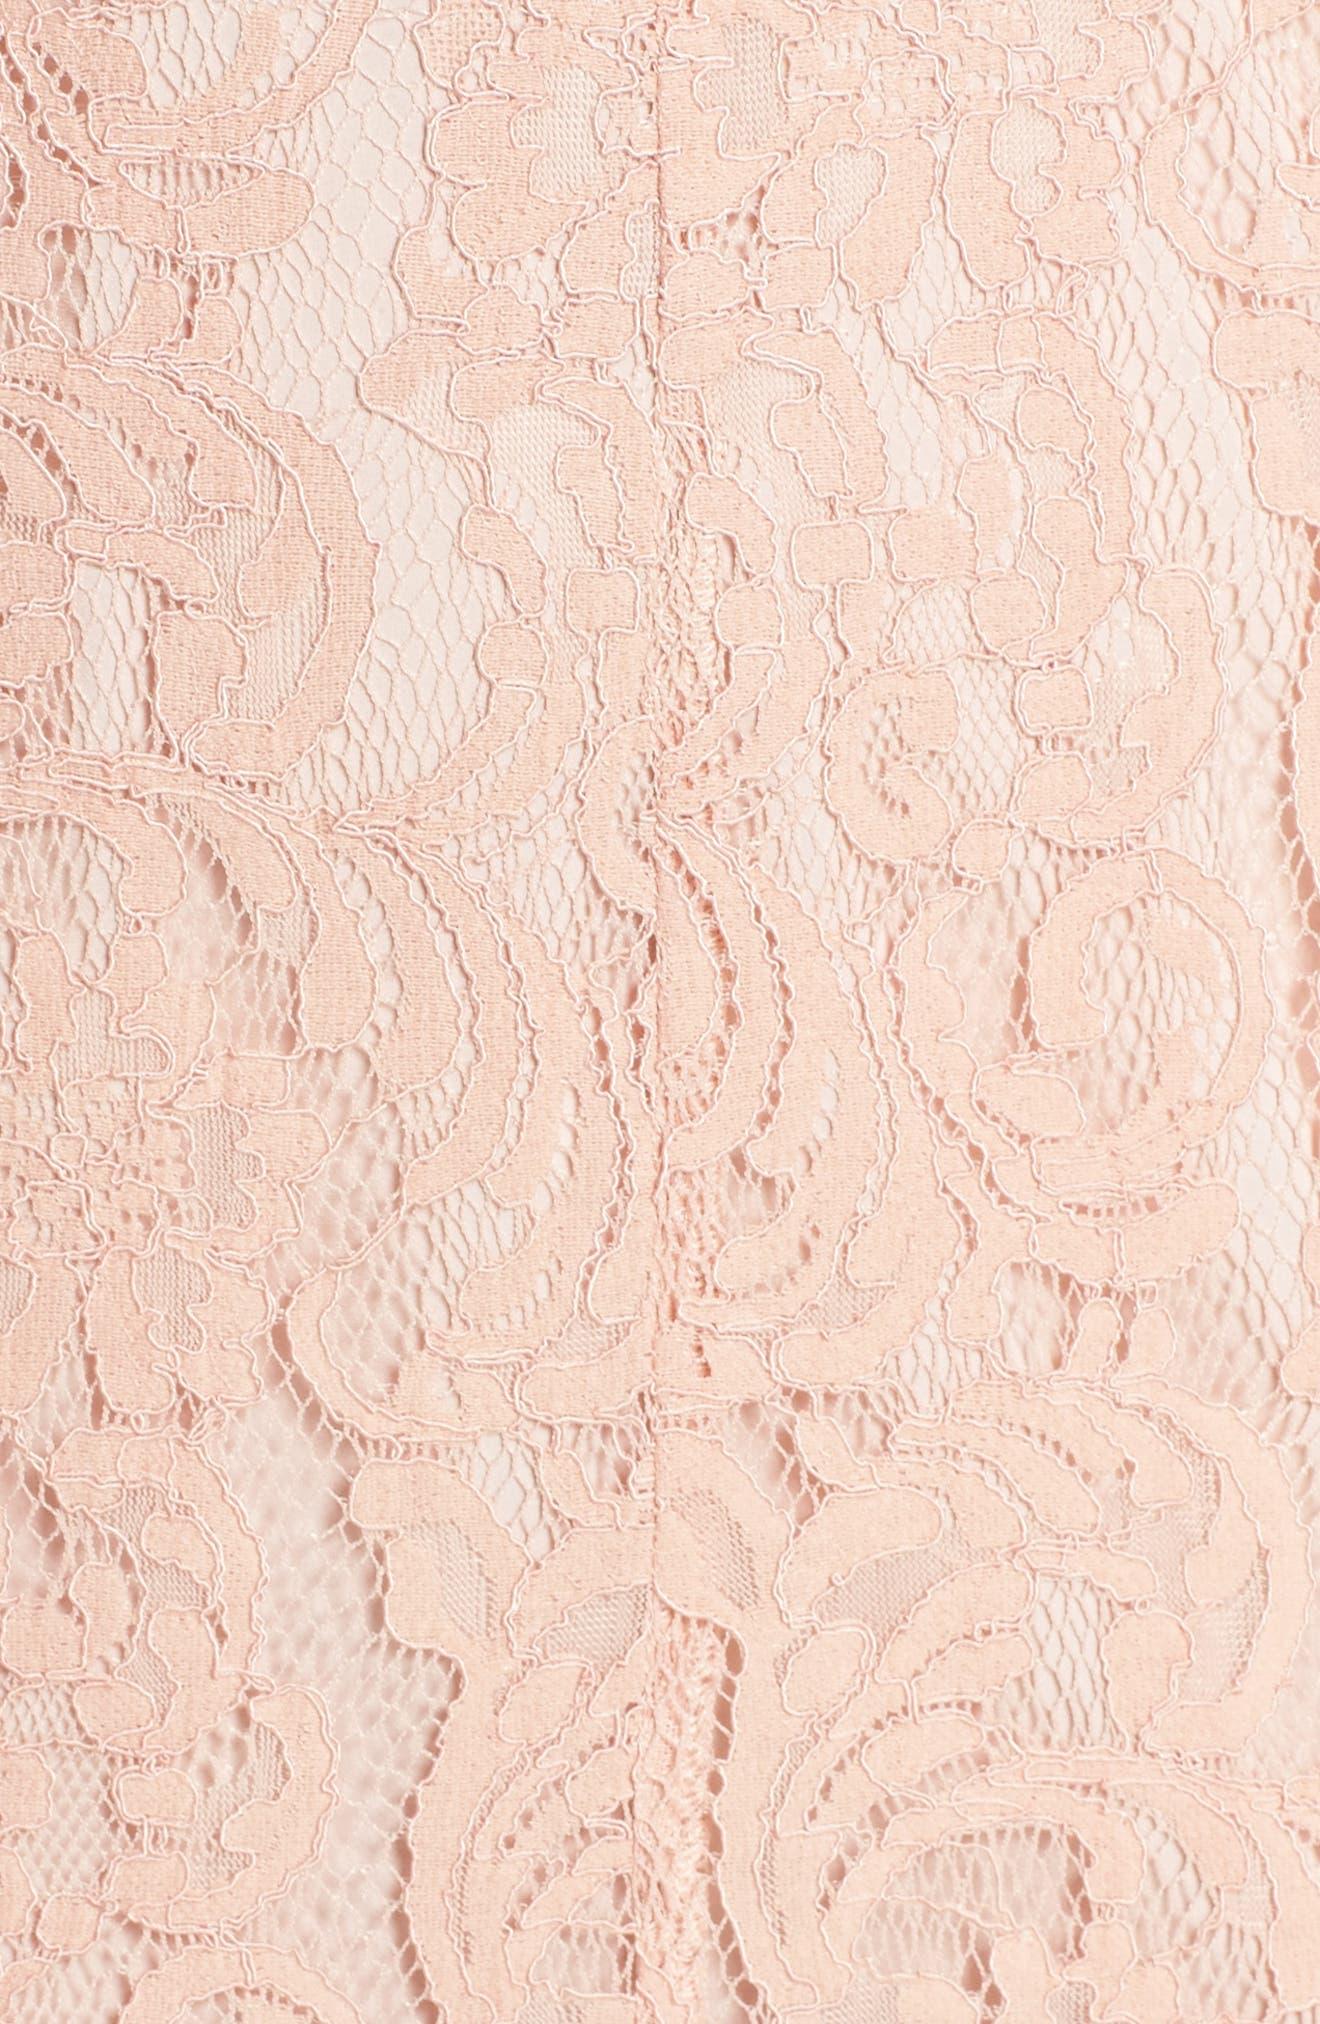 Hushed Dove Lace Dress,                             Alternate thumbnail 5, color,                             Rose Cloud